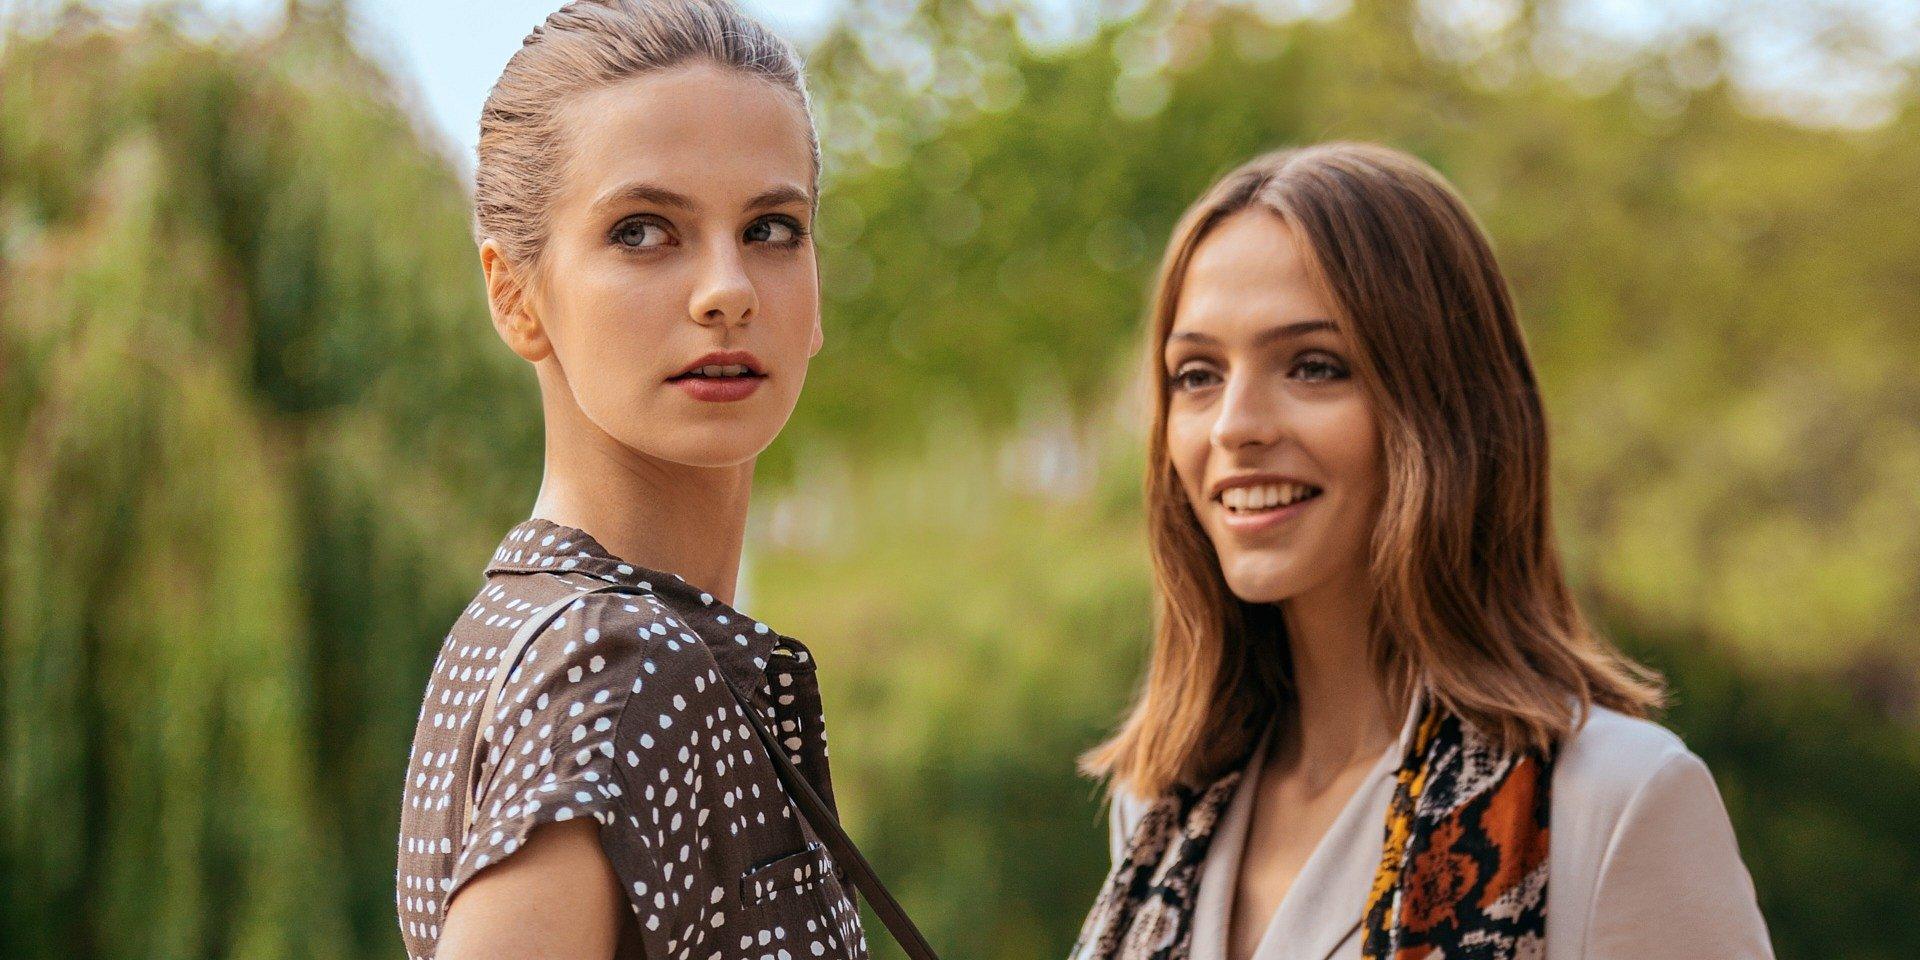 Kolekcja wiosna-lato 2020 marki Solar #ModnaSztuka.